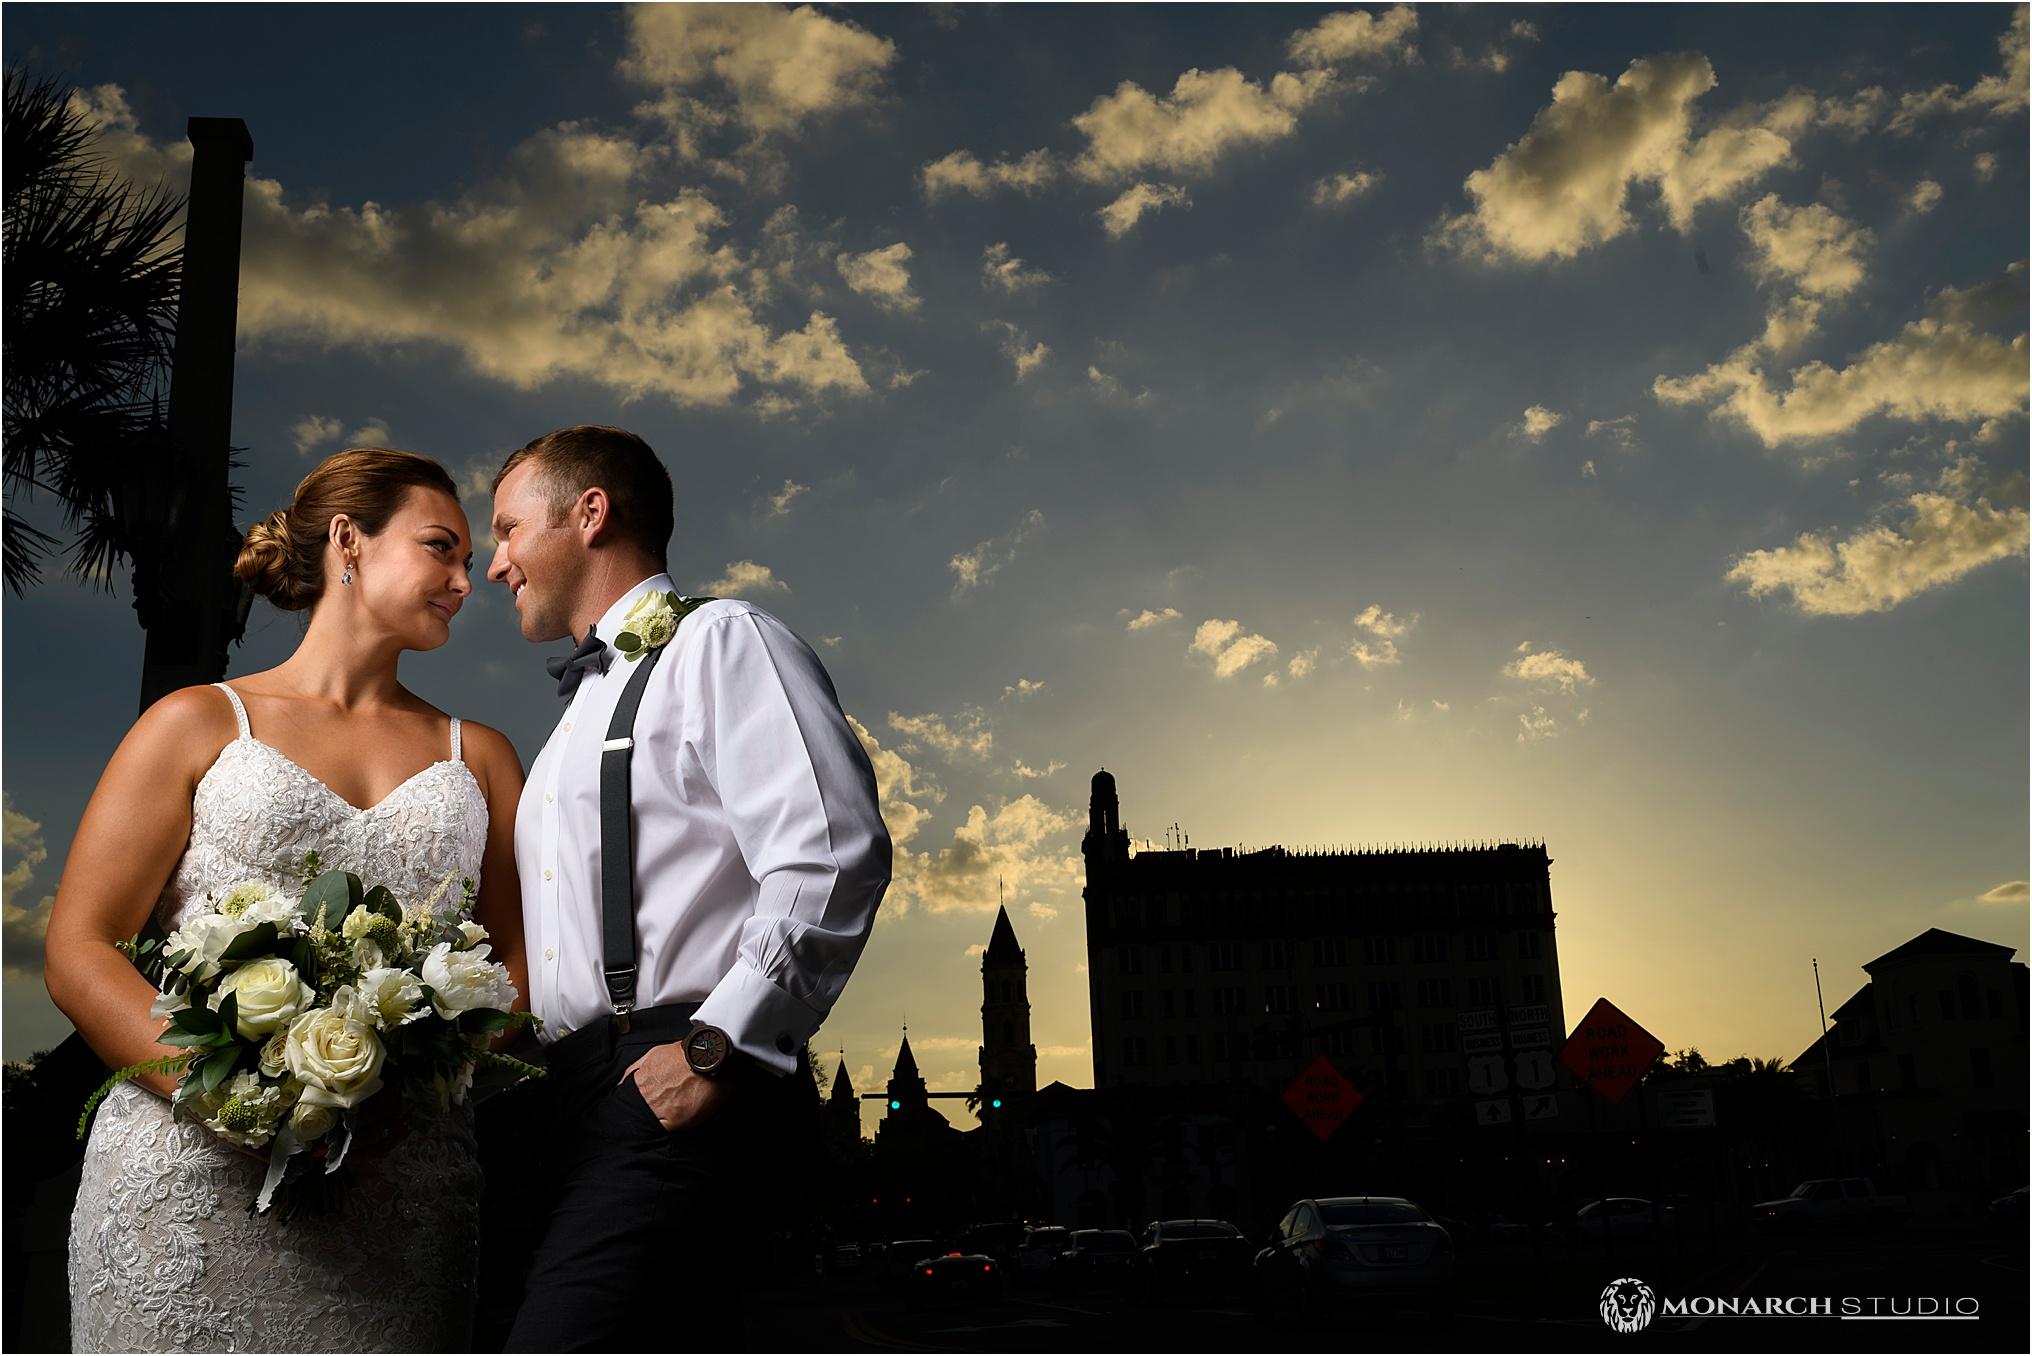 087-whiteroom-wedding-photographer-2019-05-22_0069.jpg